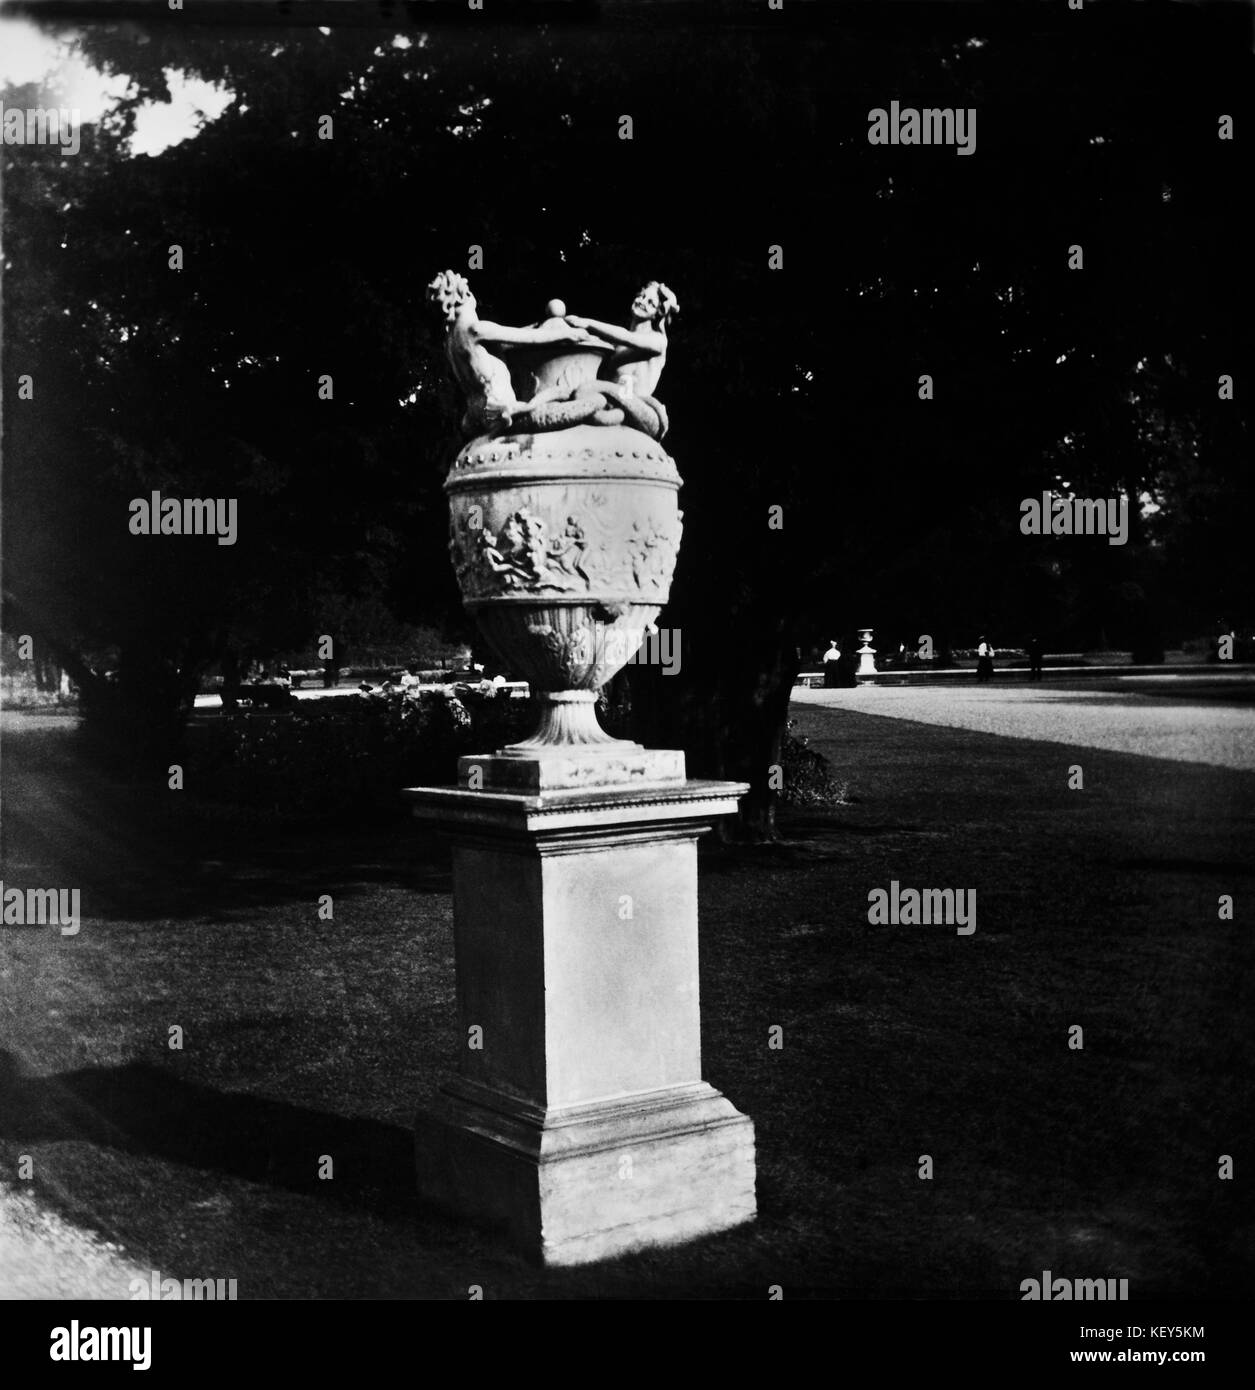 London England, Circa 1900.  Stone urn monument at Hampton Court Palace grounds. - Stock Image